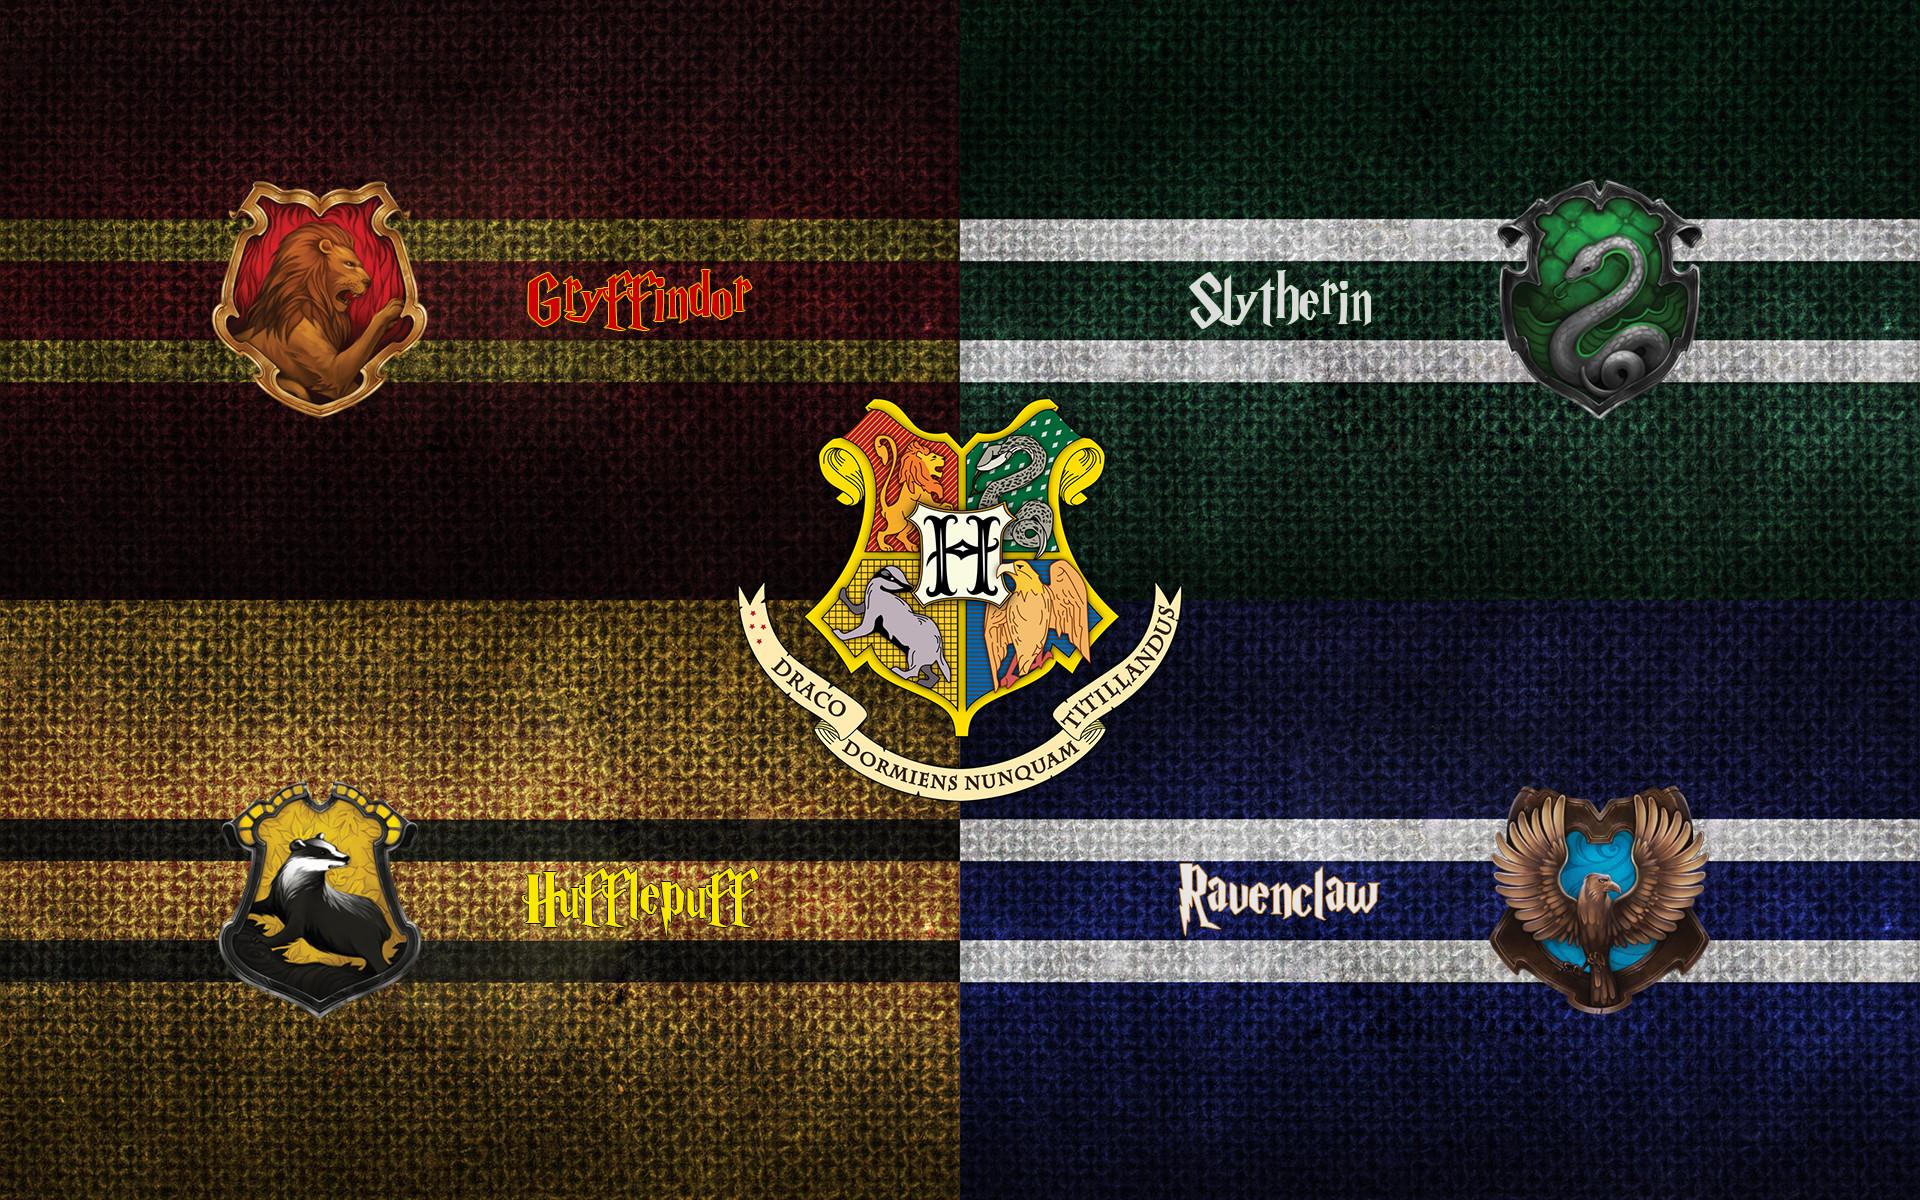 Res: 1920x1200, Harry Potter: Hogwarts Crests Wallpaper (16:10) ; ()